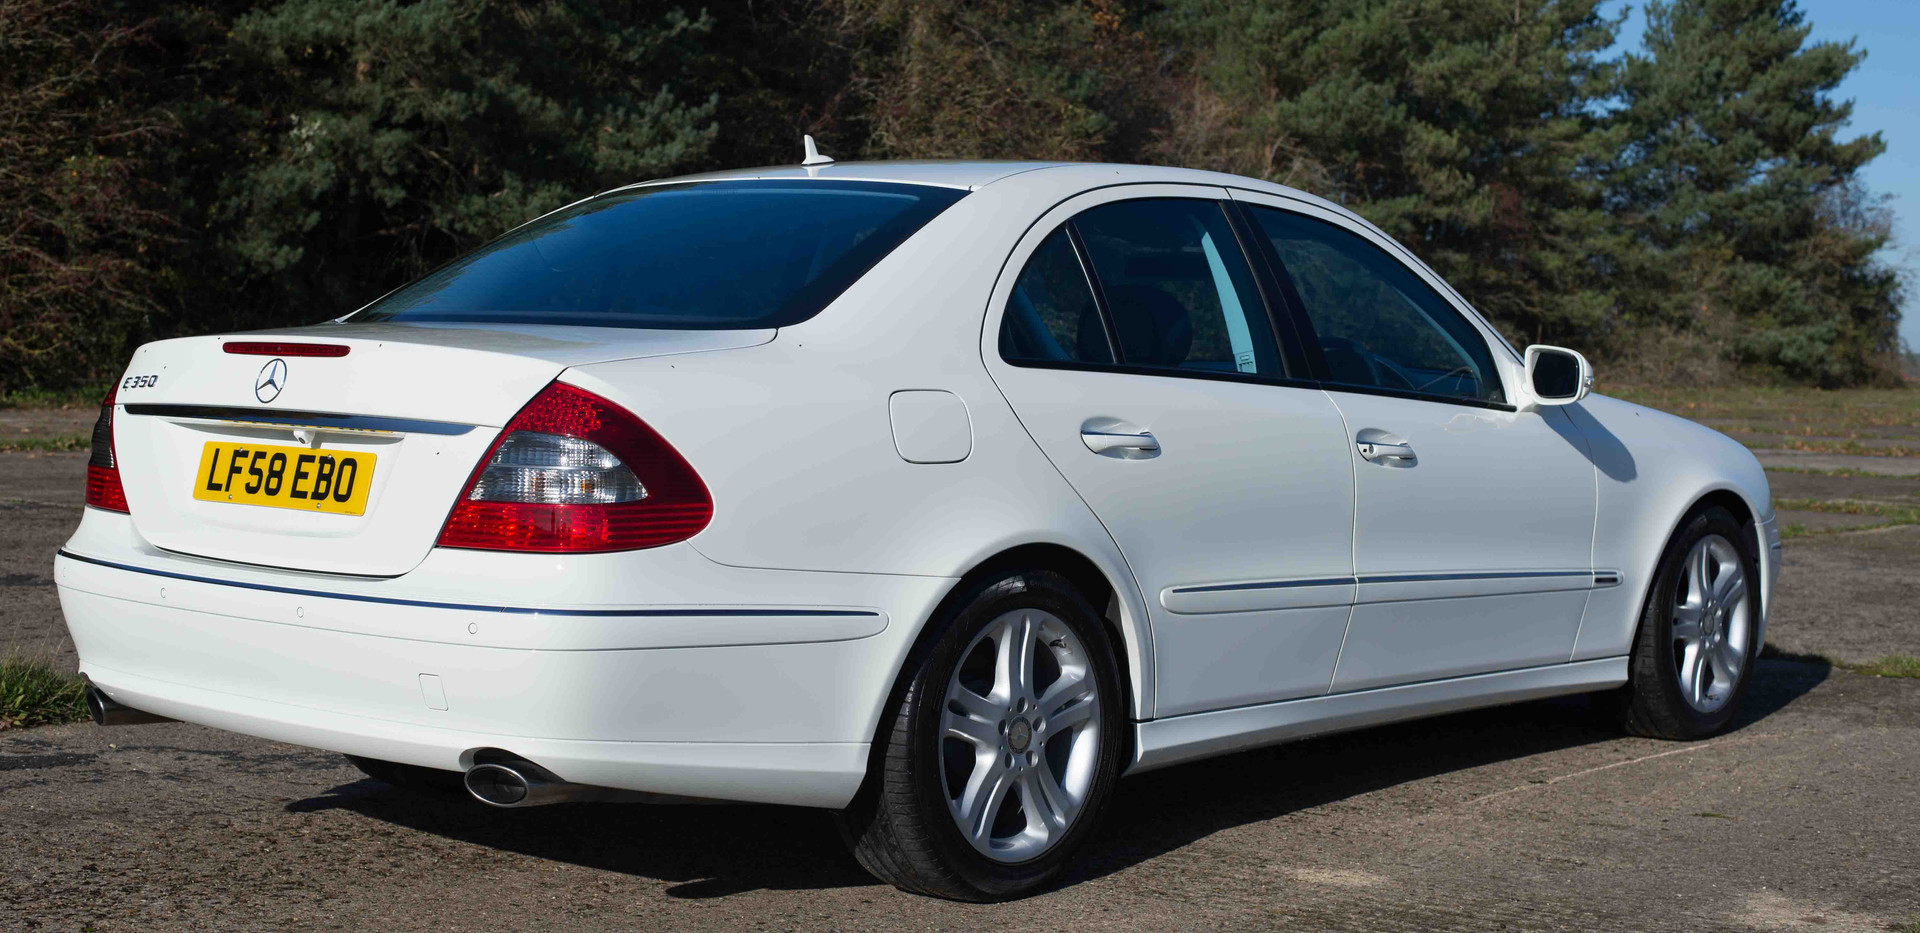 Mercedes E350 For Sale UK London  (14 of